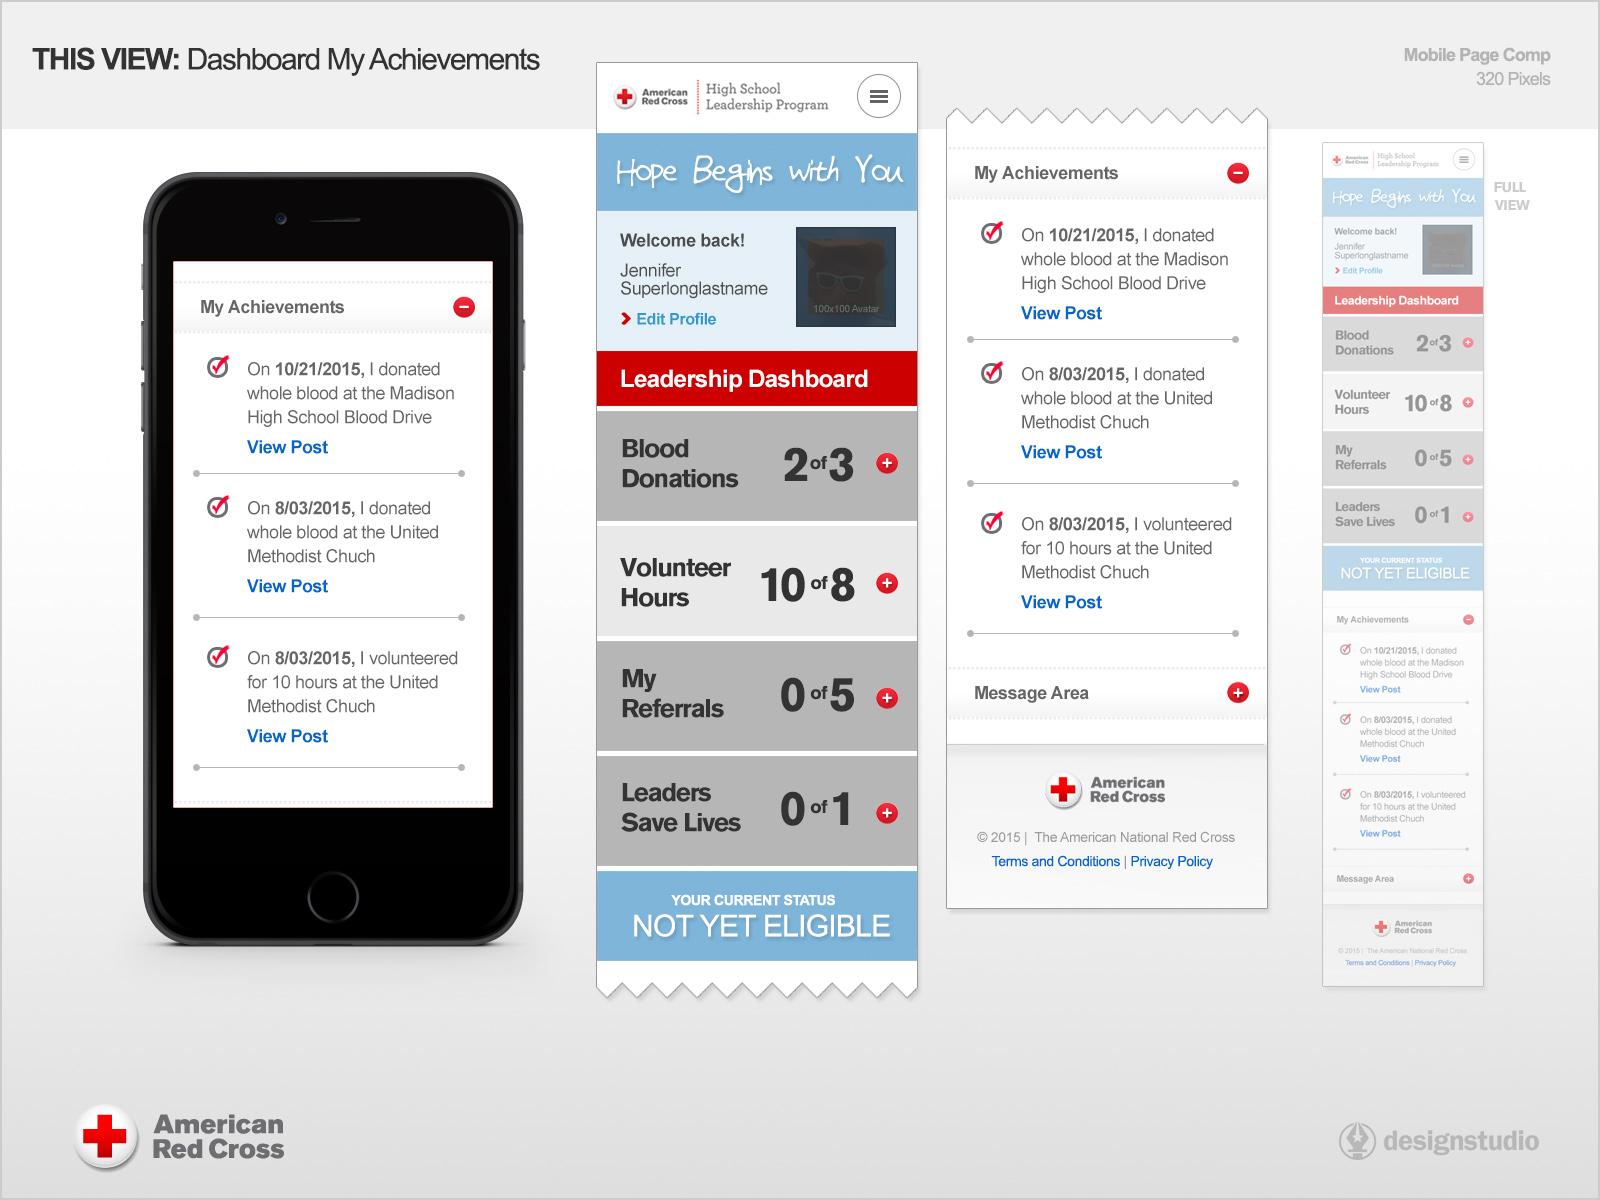 HSL-Mobile+Dashboard-Achievements.jpg